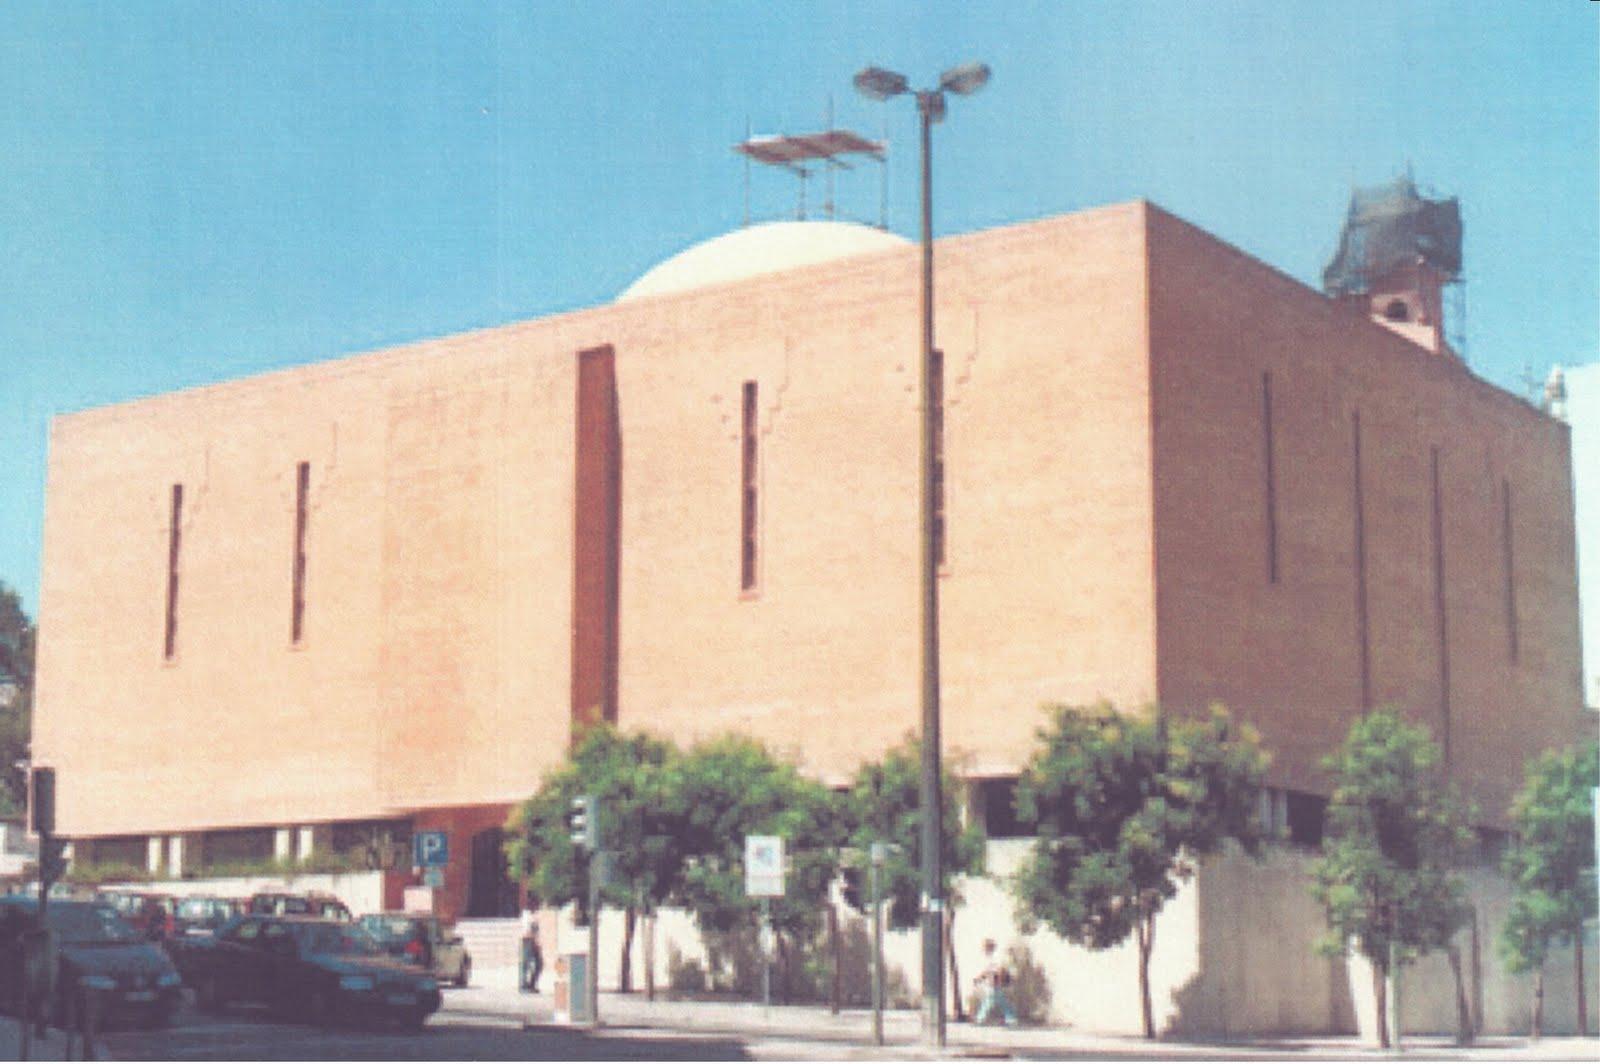 Procurando Famoso Mesquita-2290